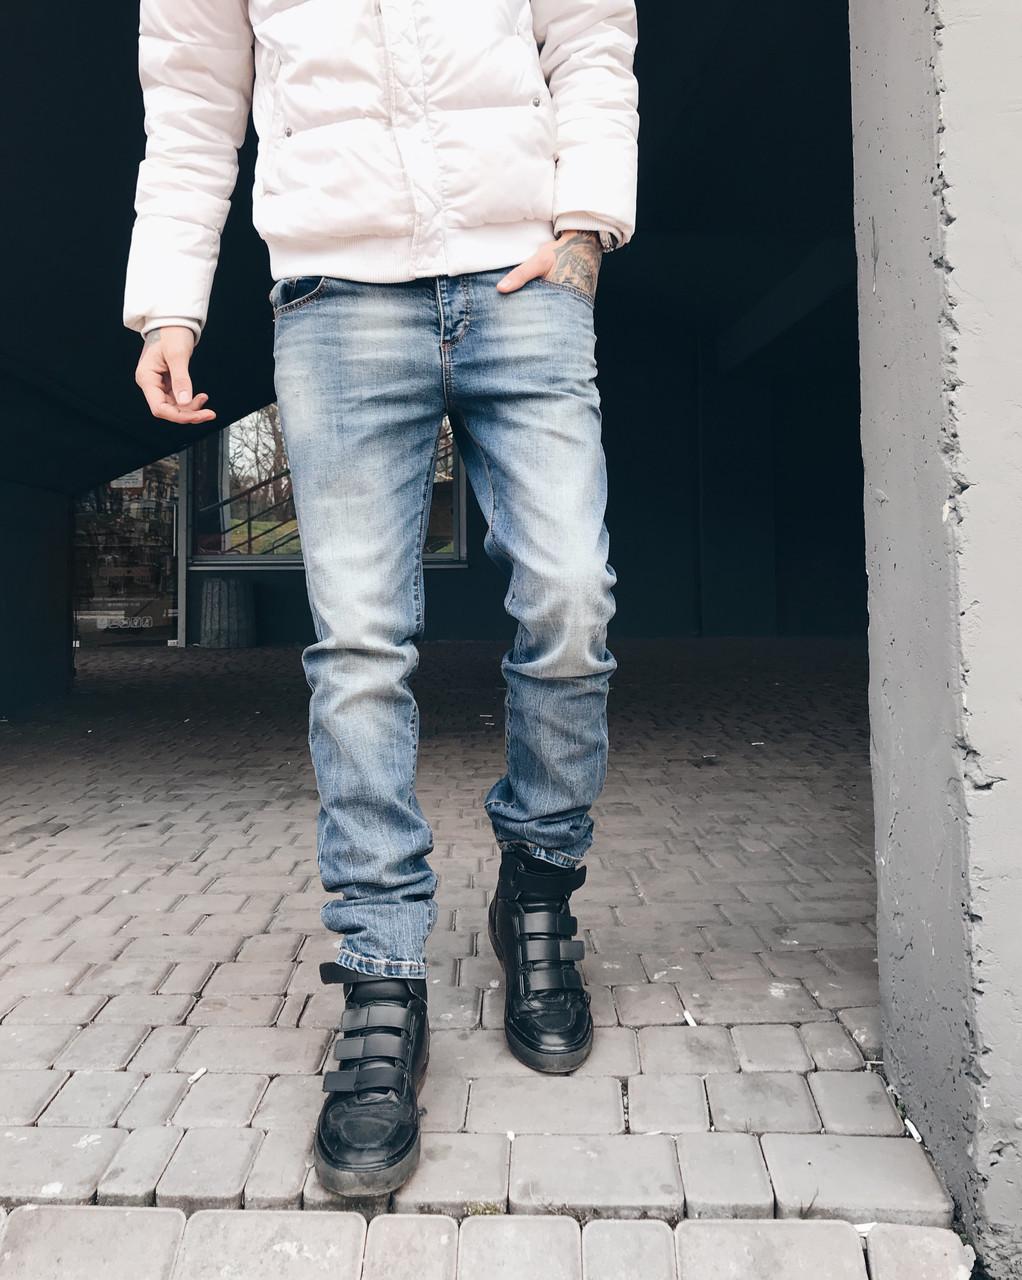 9c1d2038f973 5477 Dsquared джинсы мужские весенние стрейчевые (30,30,31,32,32,33,38, 7  ед.) : продажа, цена в ...